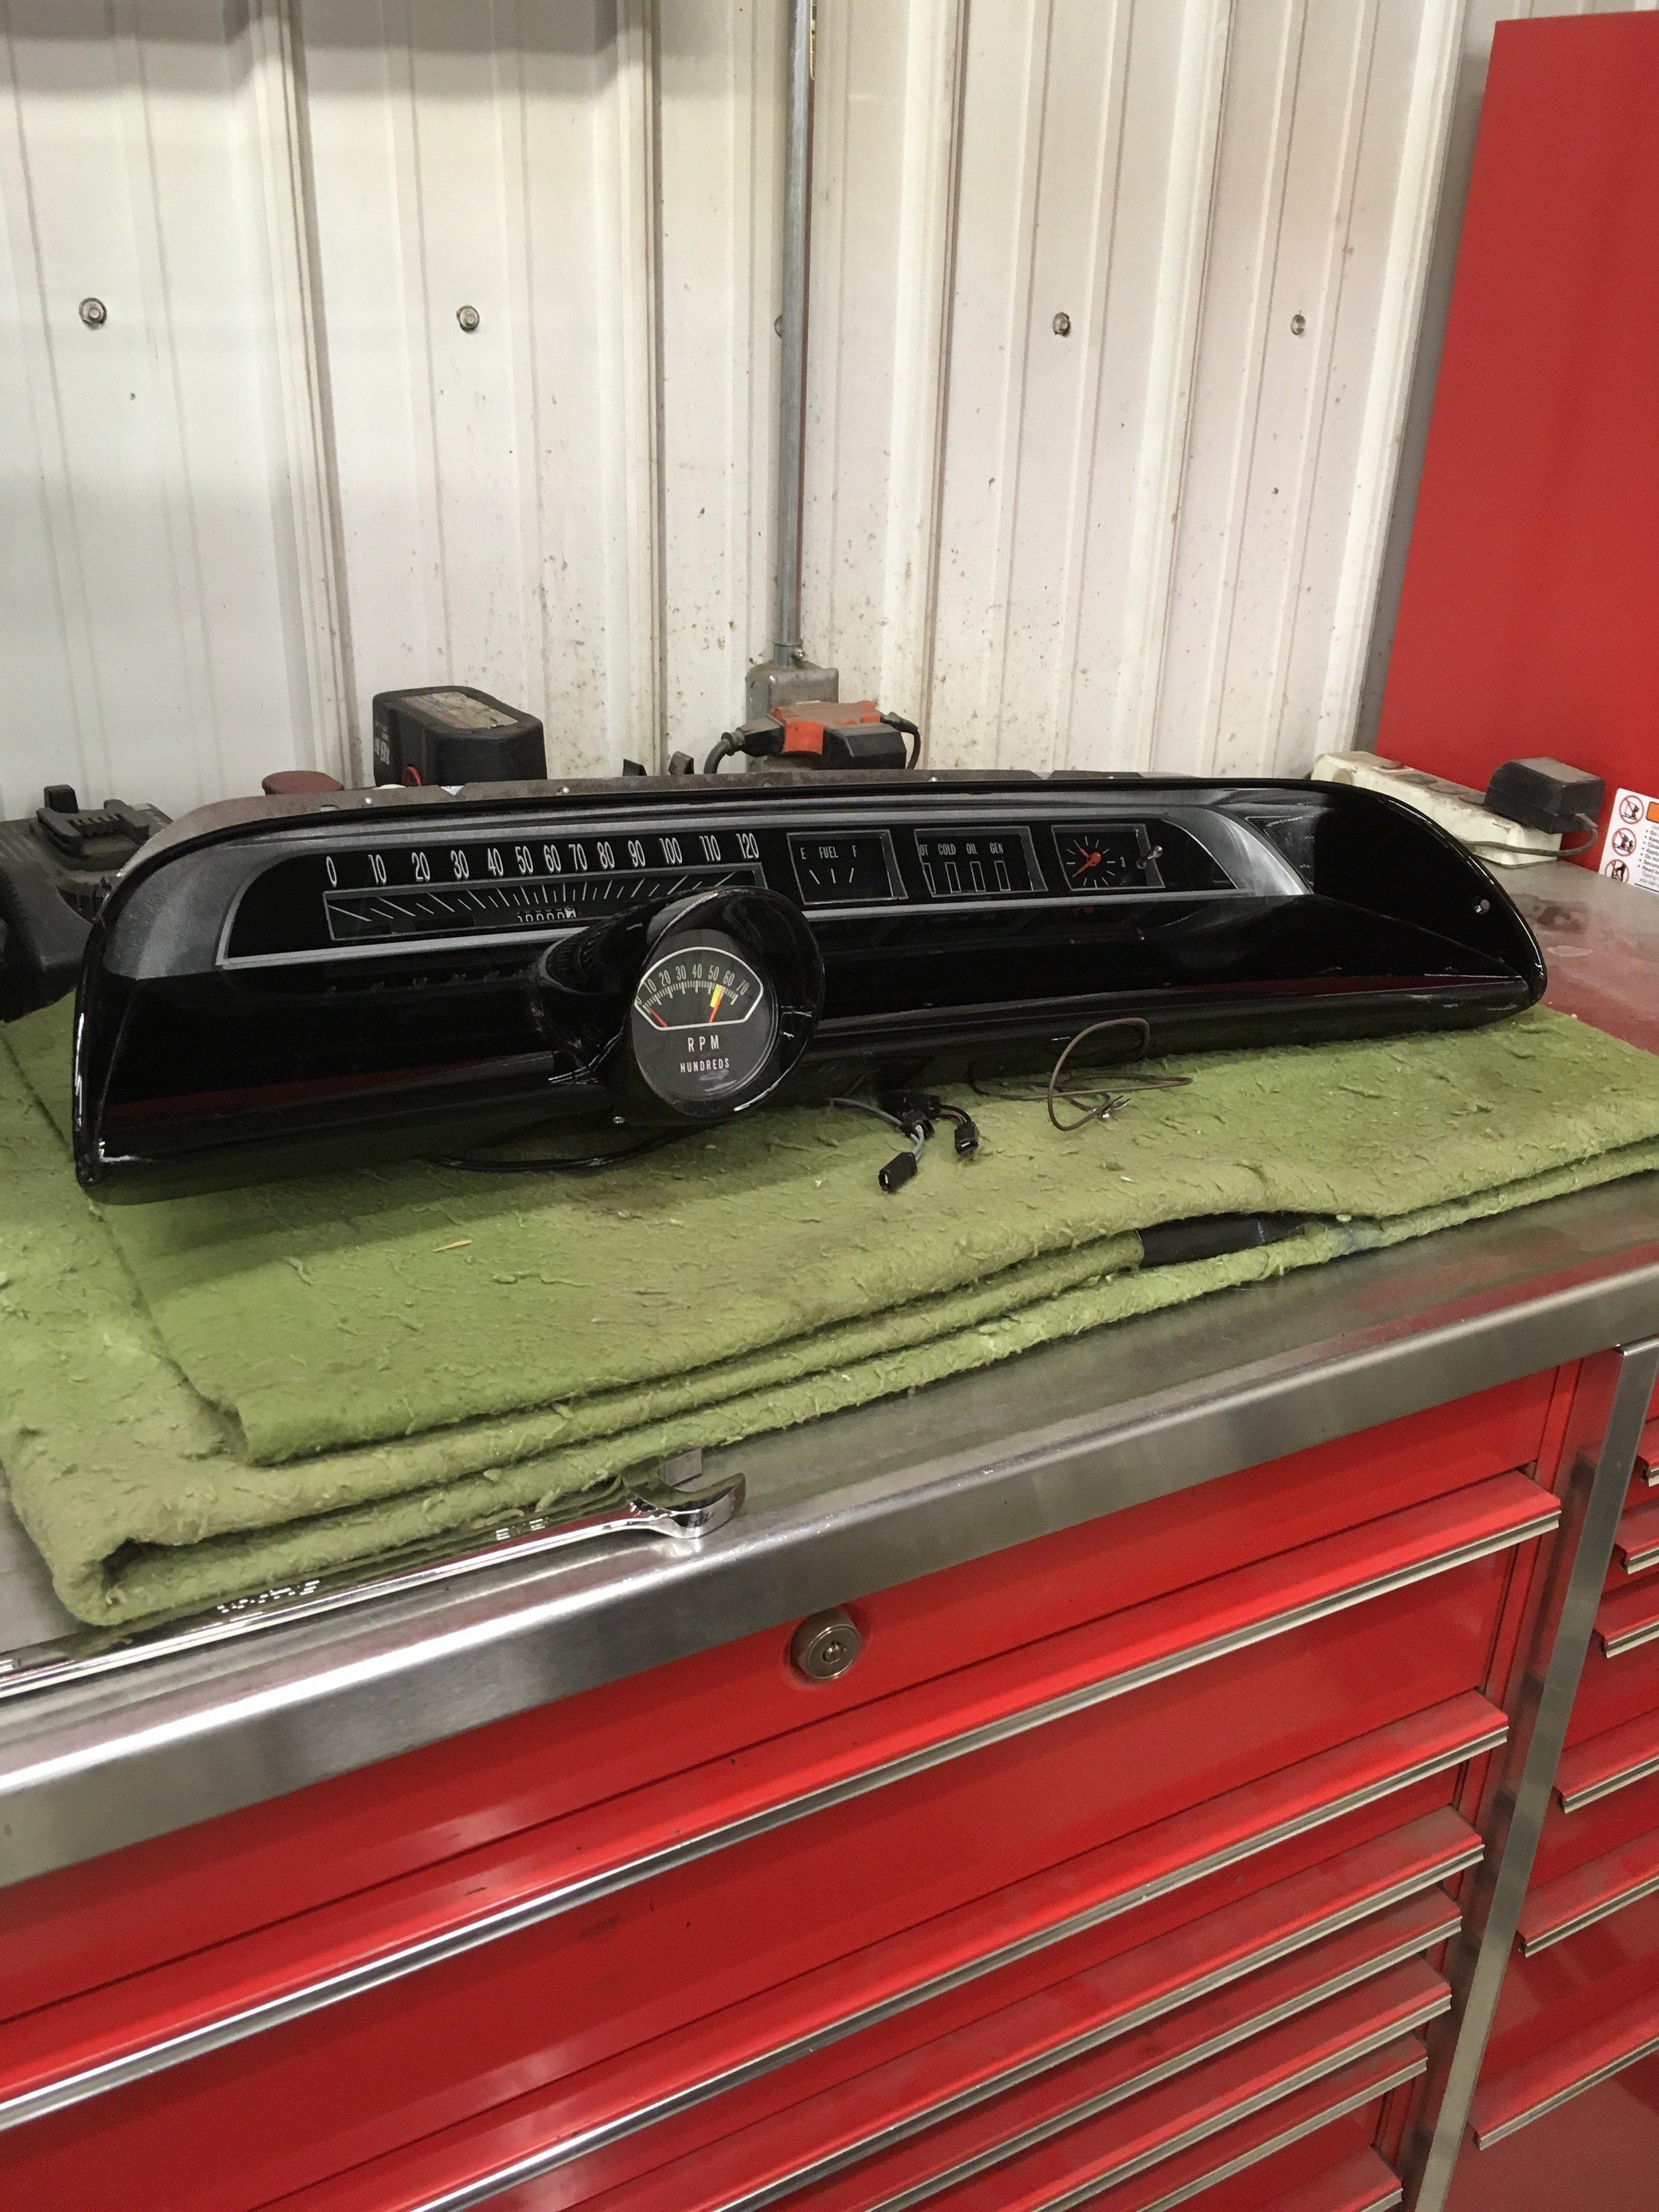 1964-Impala-SS-minneapolis-hot-rod-custom-built-restorations-19.jpg